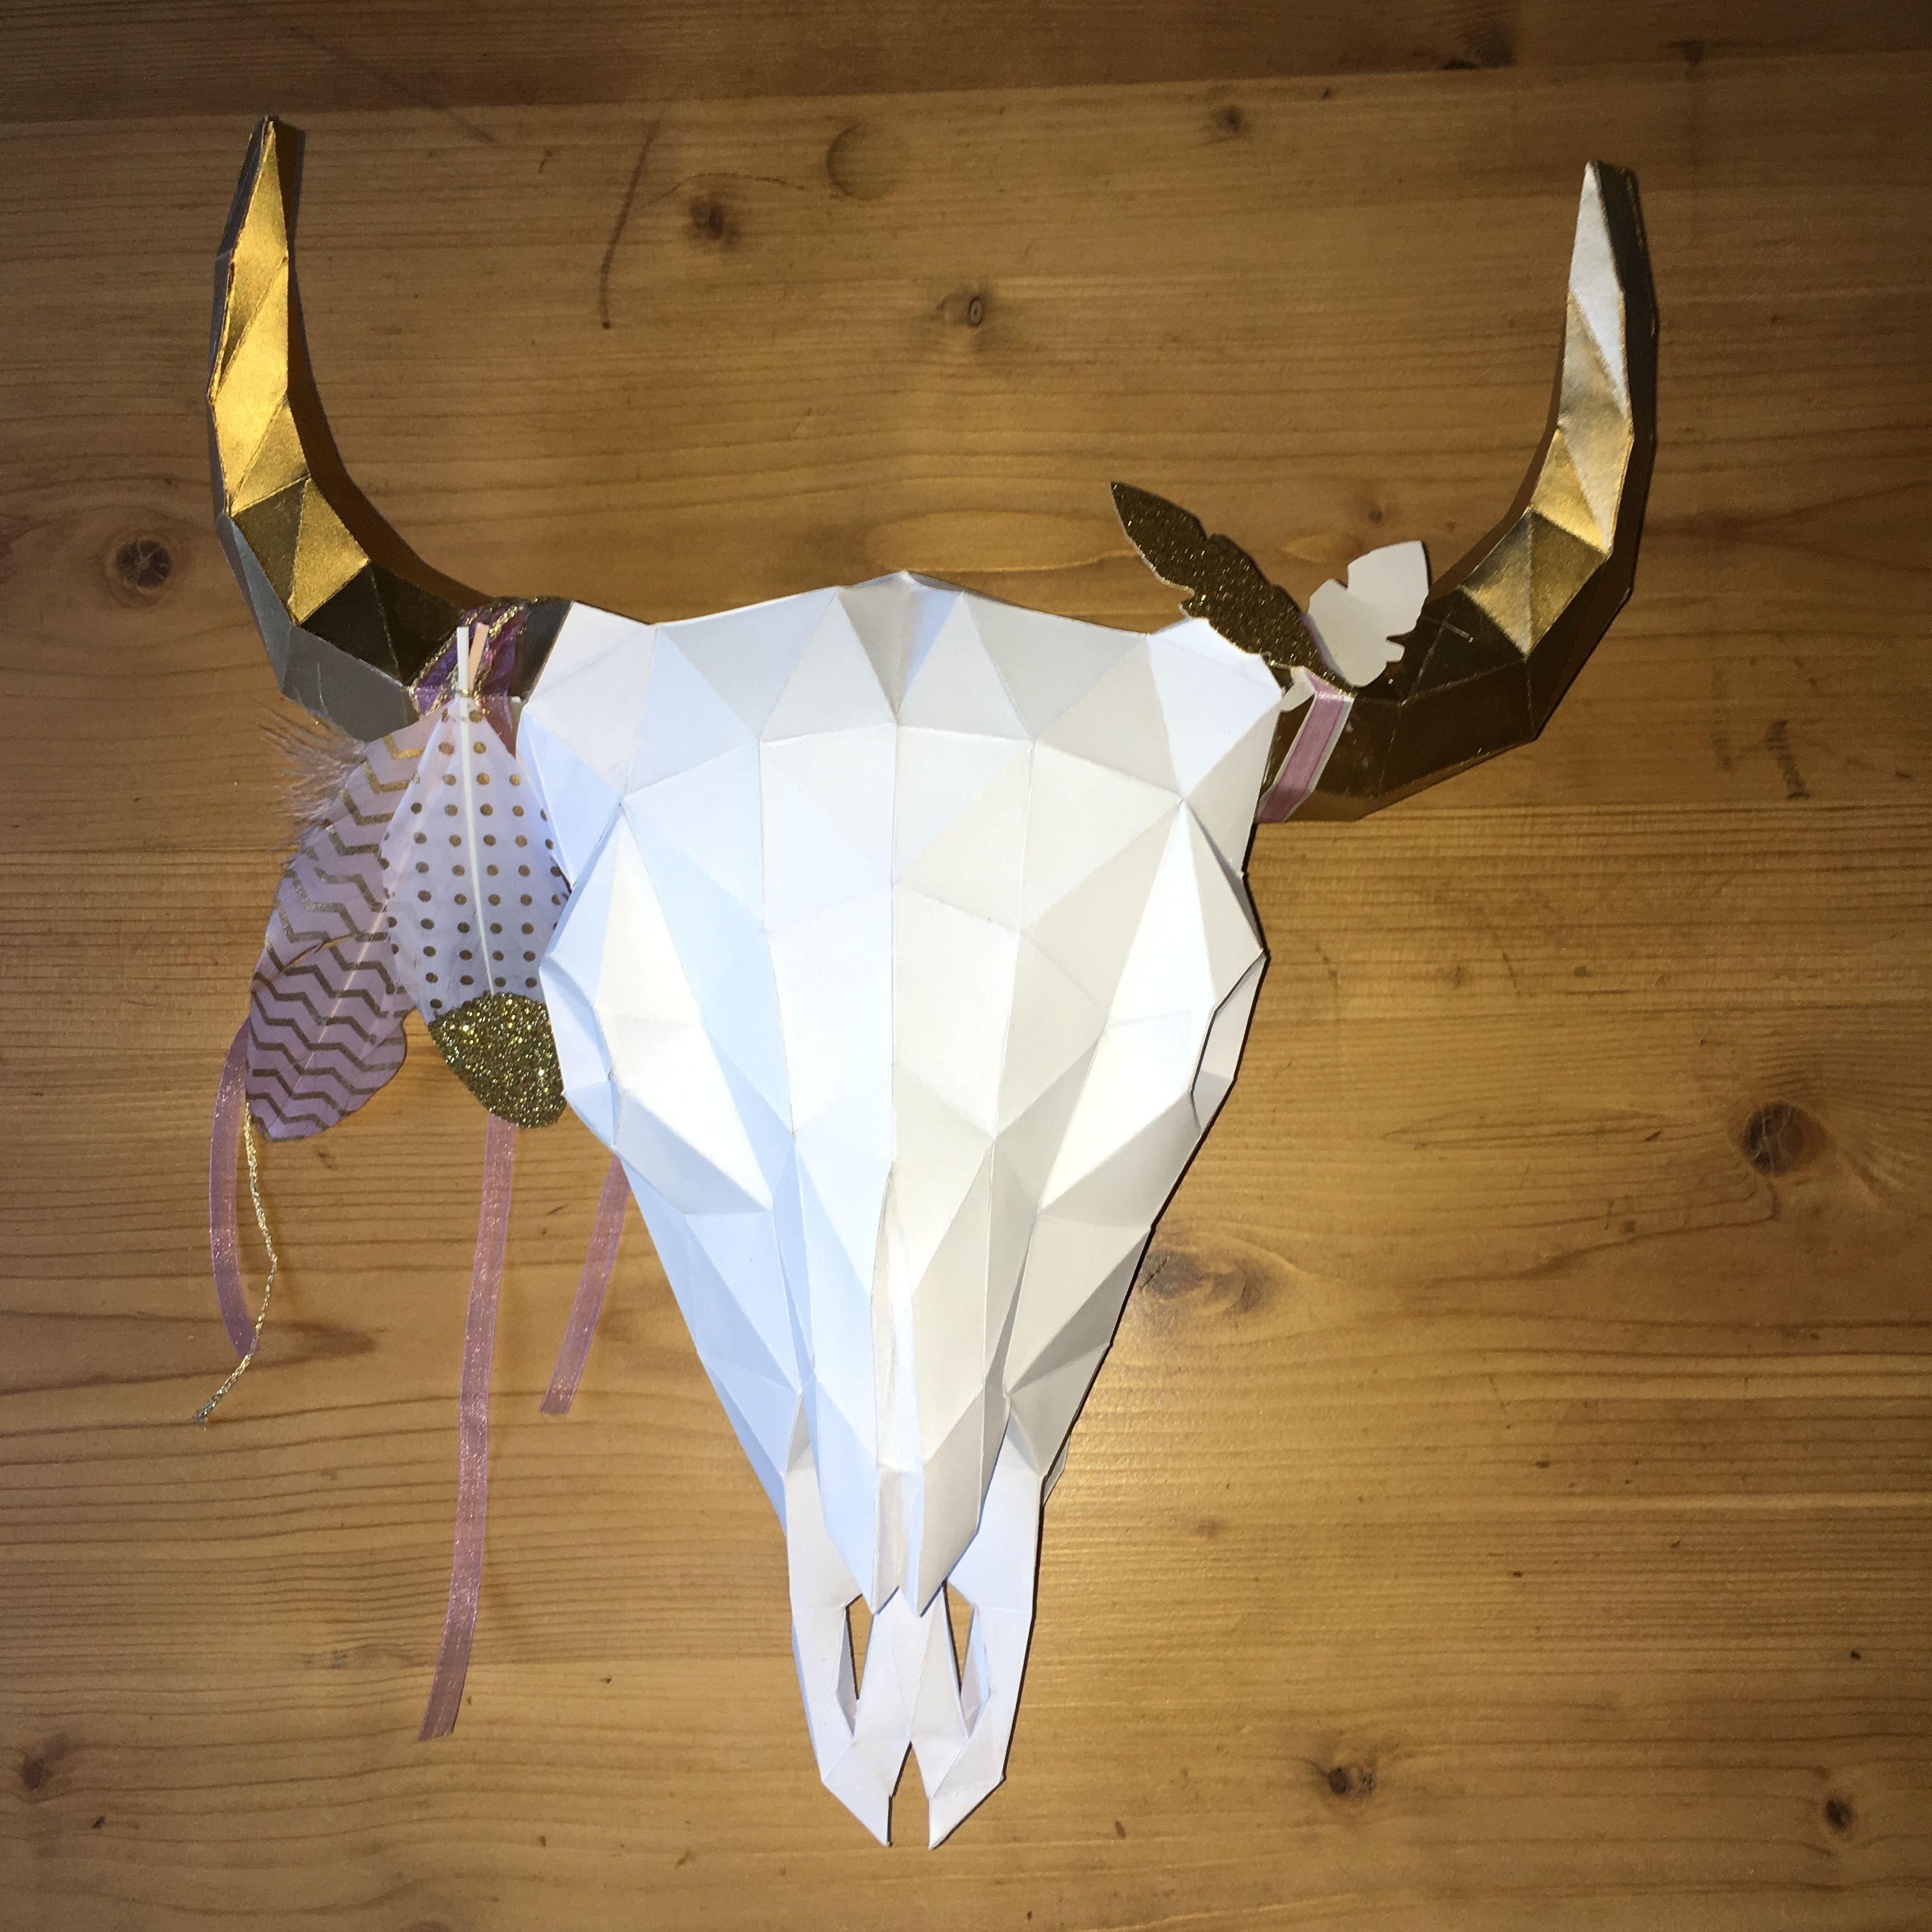 Skull Papercraft Buffalo Skull Papercraft Tªte De Bison Trophée Trophy